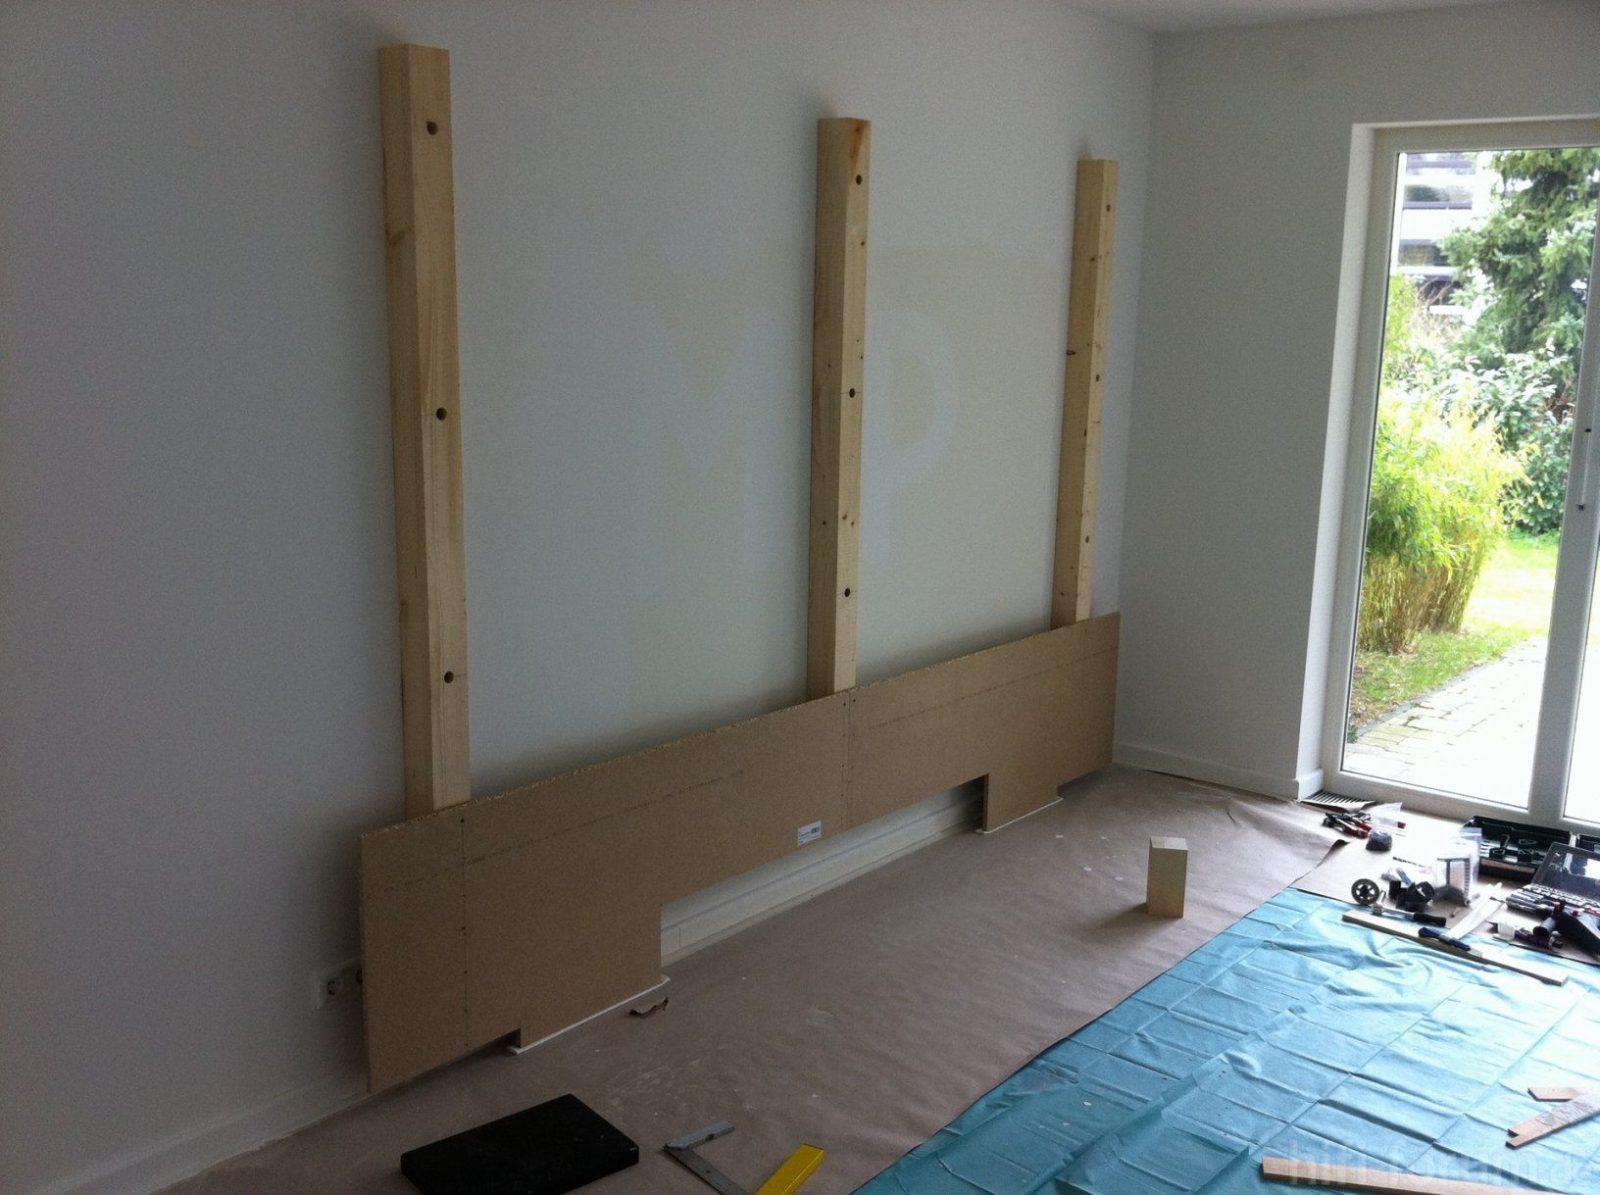 fachwerk raumteiler selber bauen cool bett selber bauen fr ein bett von fachwerk raumteiler. Black Bedroom Furniture Sets. Home Design Ideas